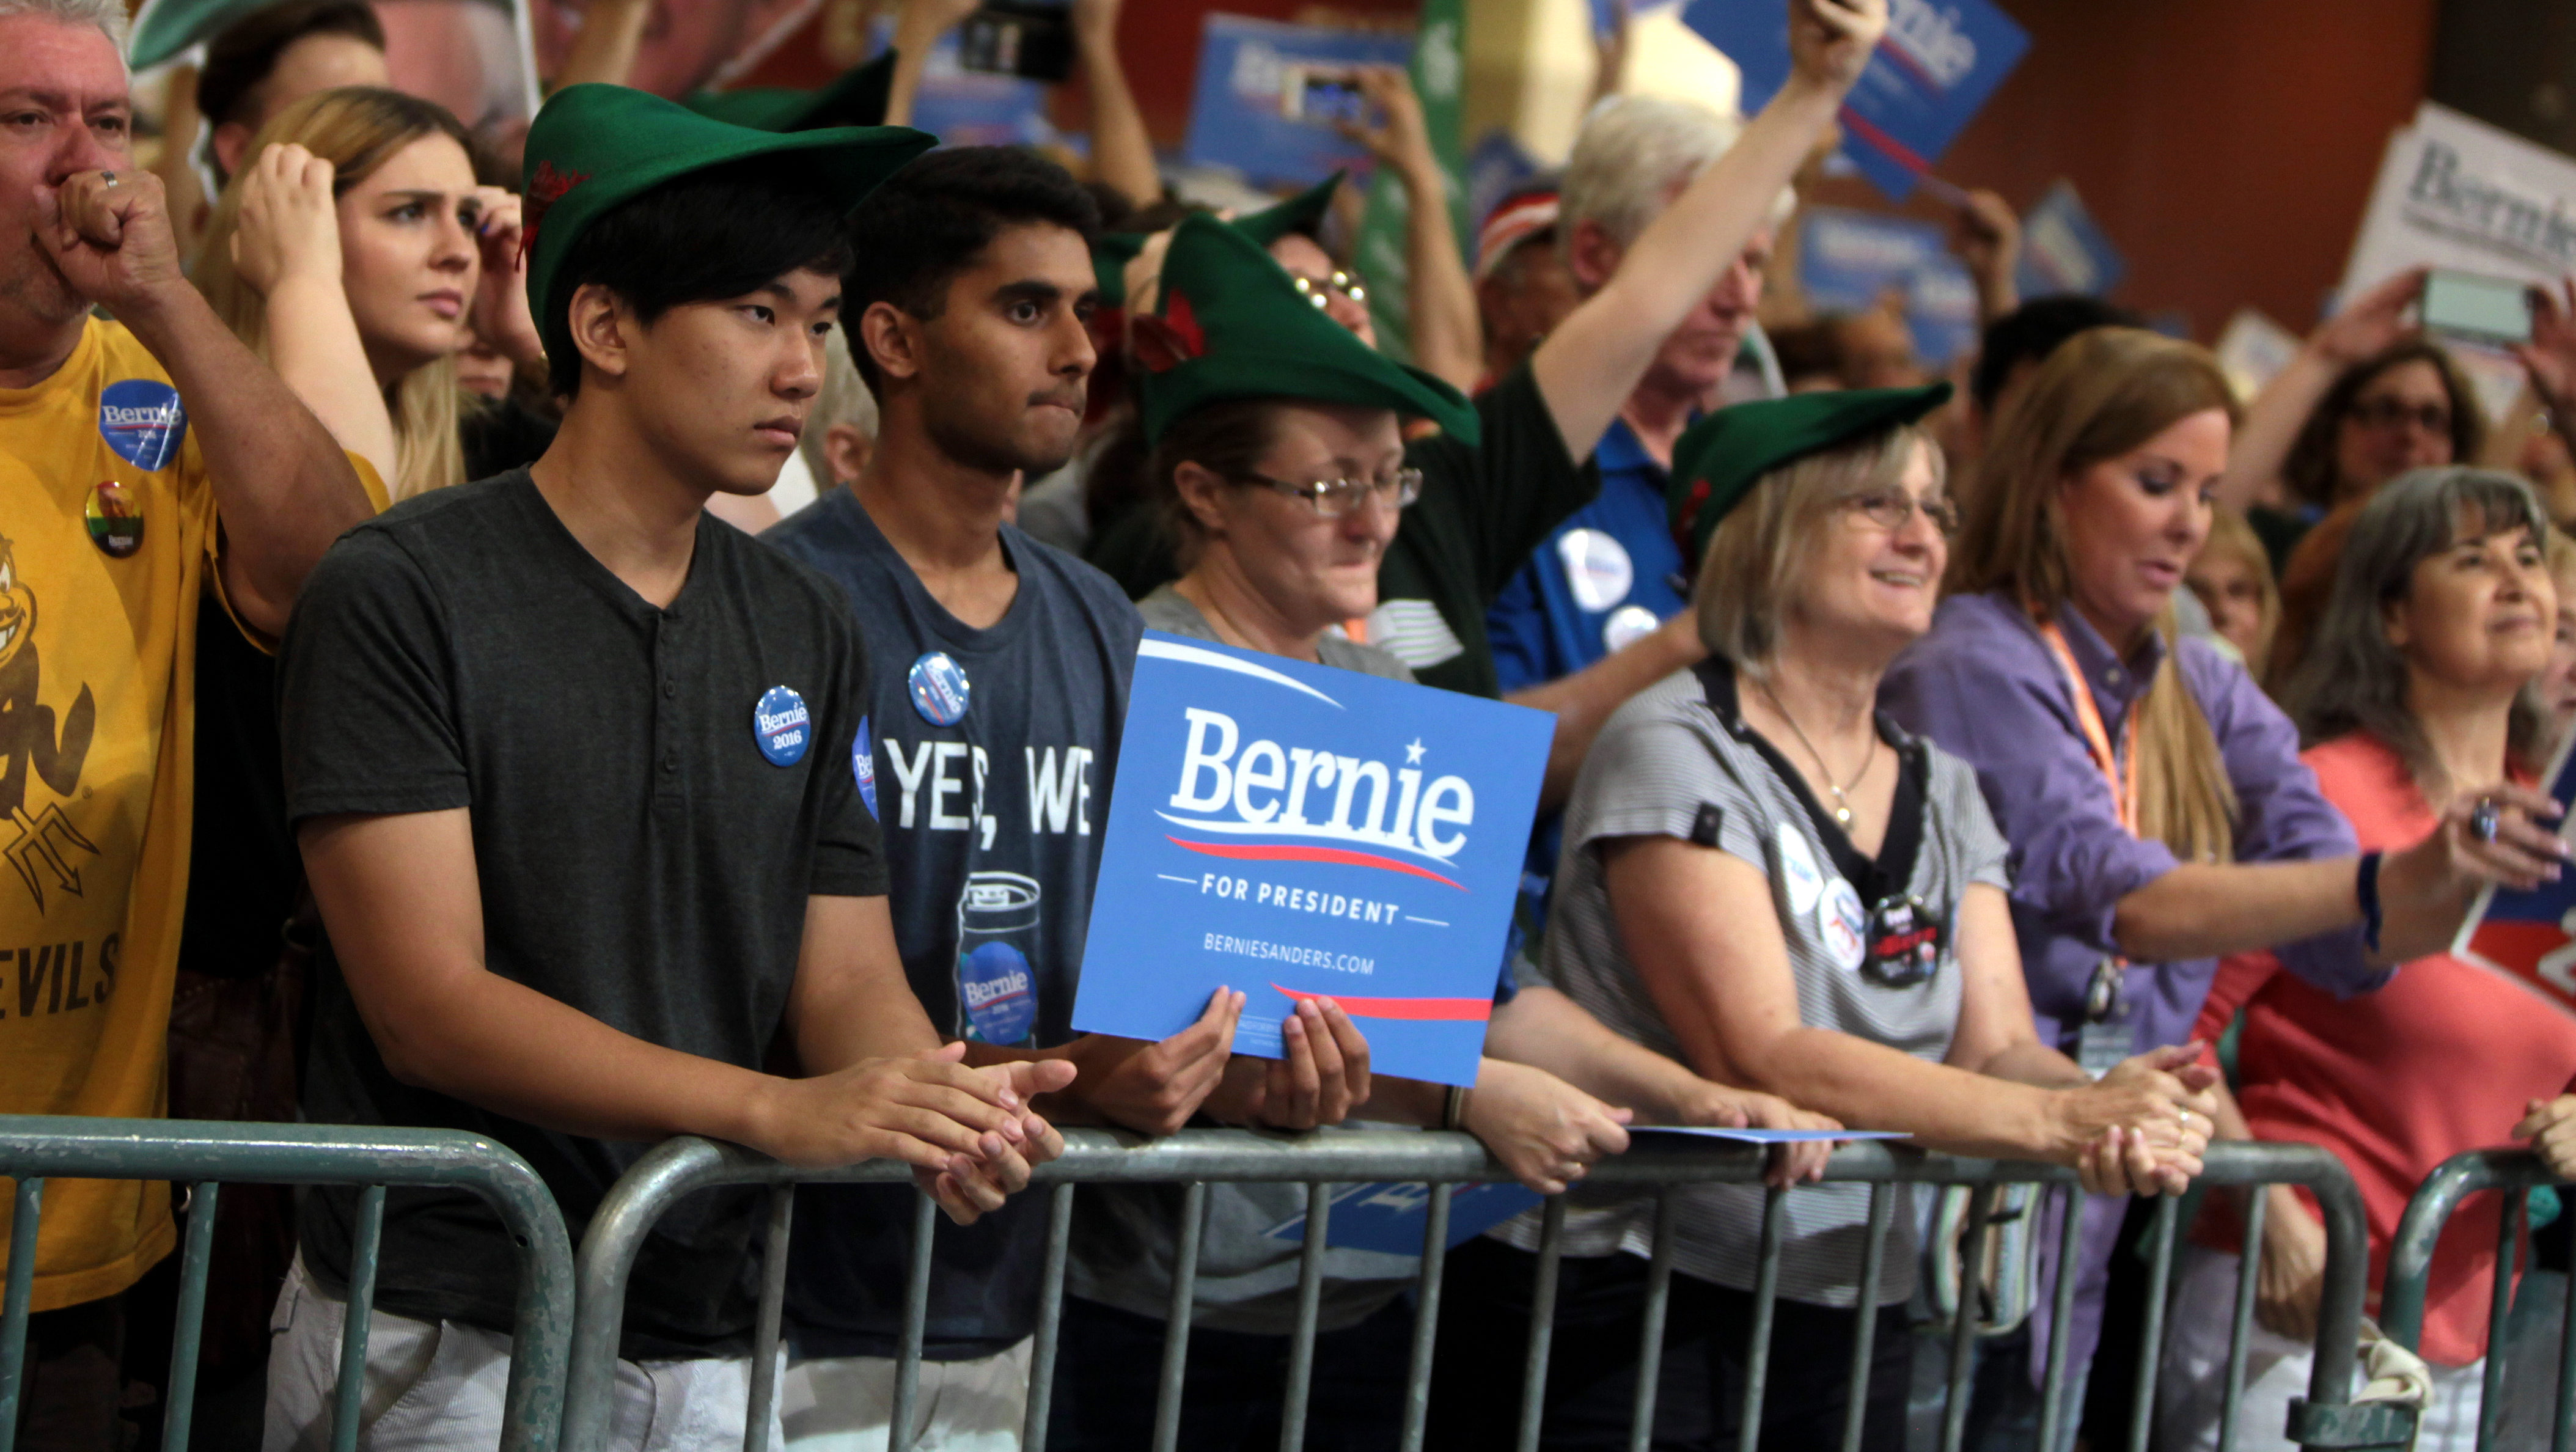 Sanders supporters at a town meeting in Phoenix, Arizona, July 2015. (Gage Skidmore via Flickr)